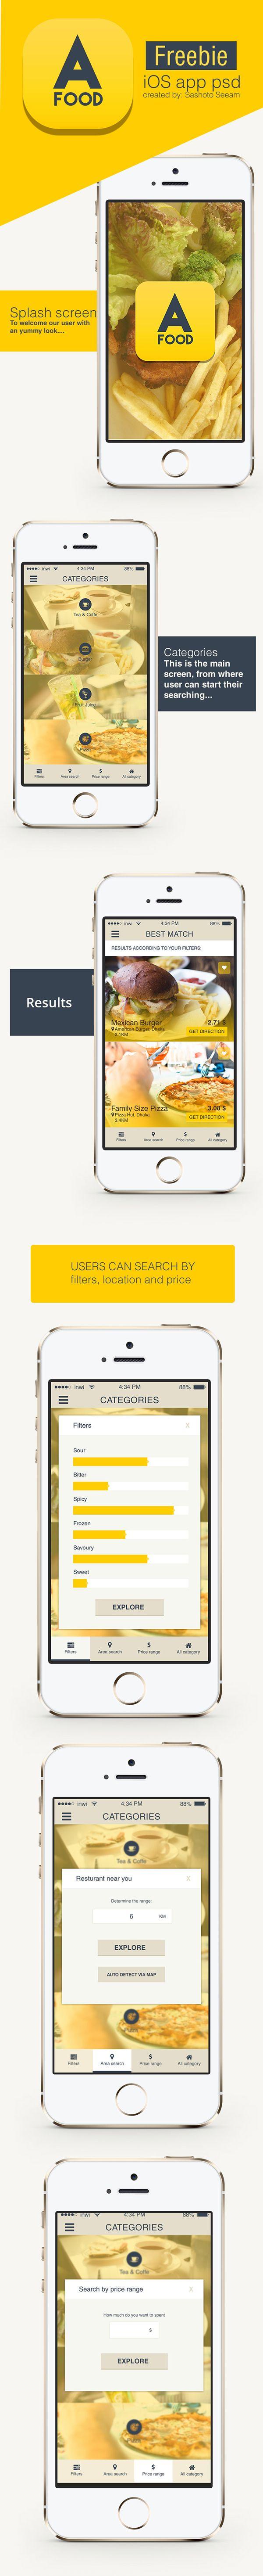 Restaurant Finder App Free Download Psd